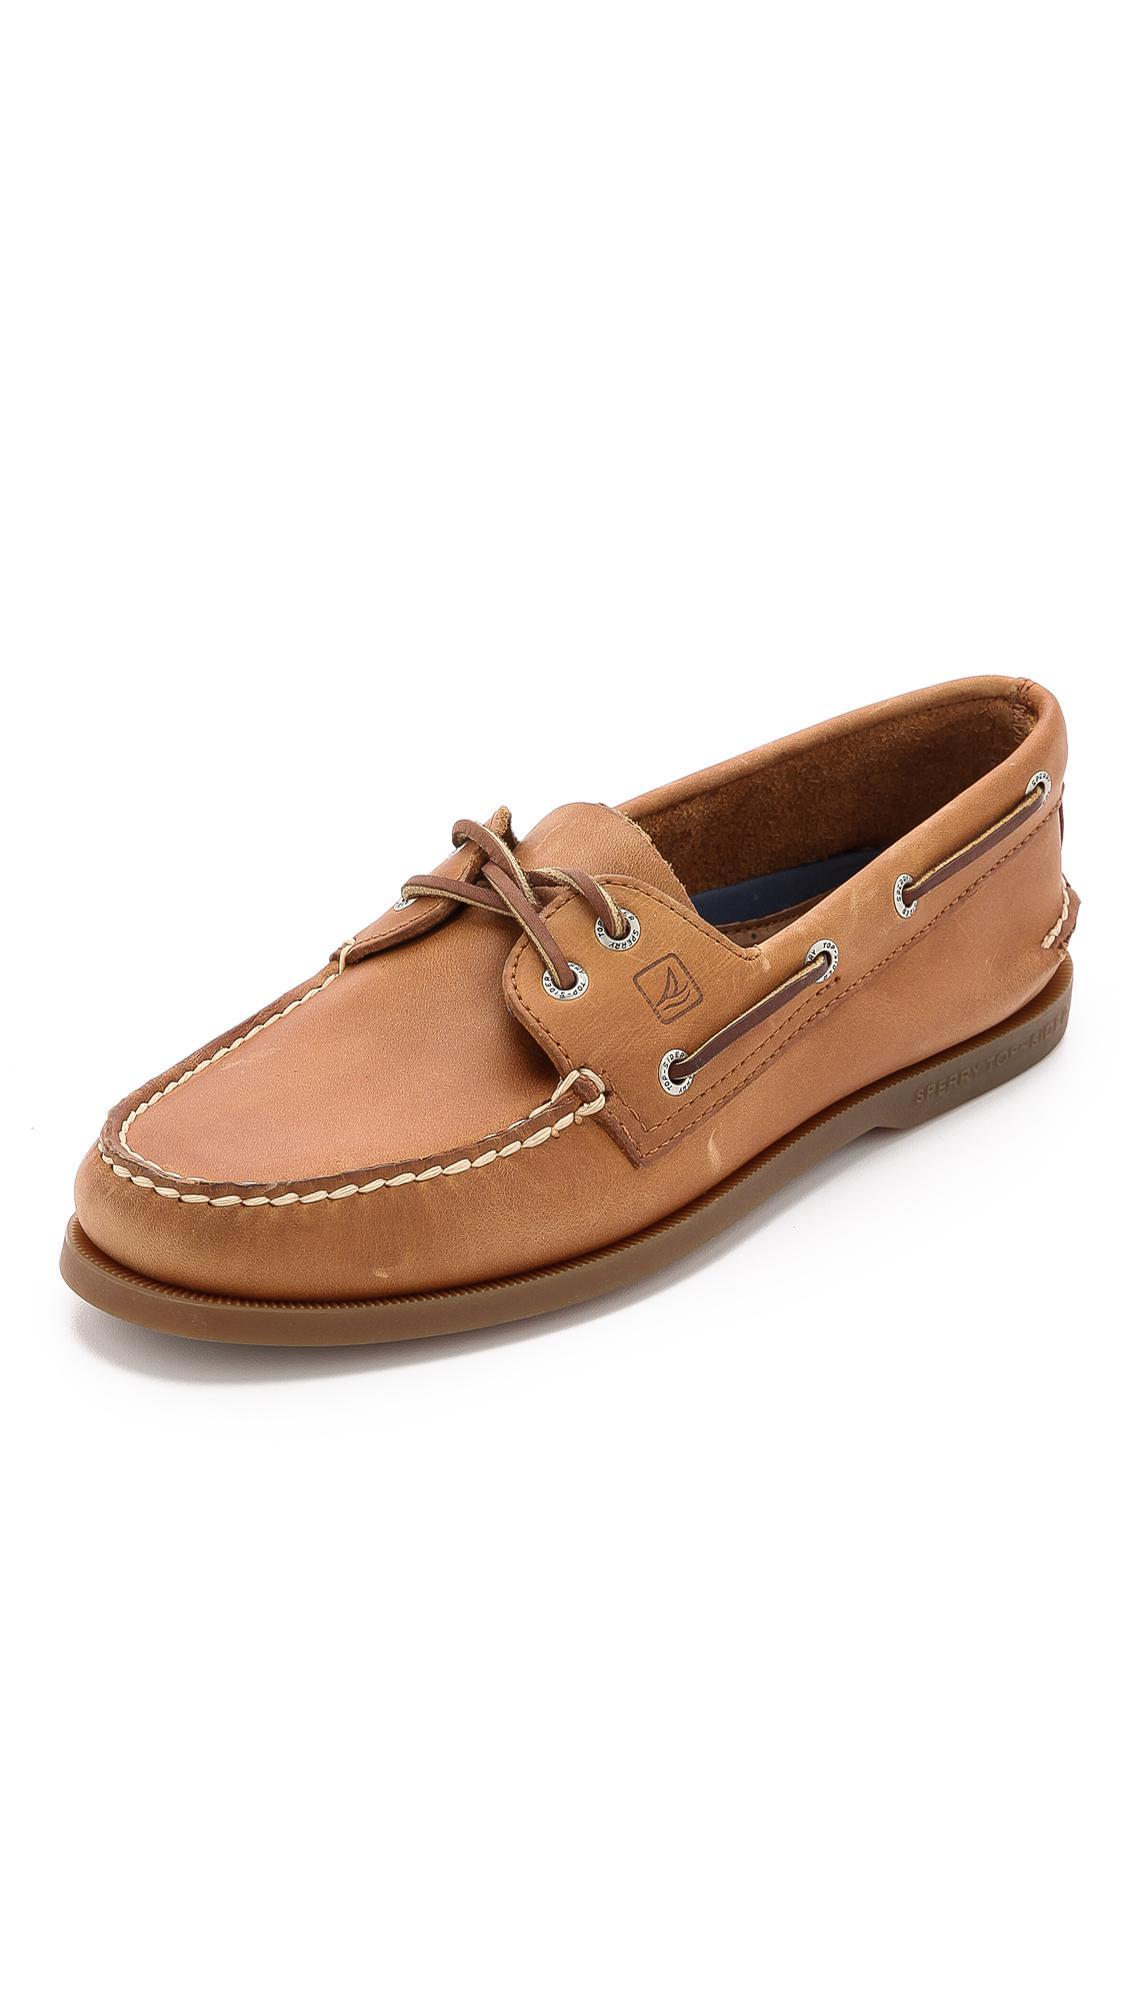 Sperry Men S Boat Shoes Dark Tan Sale